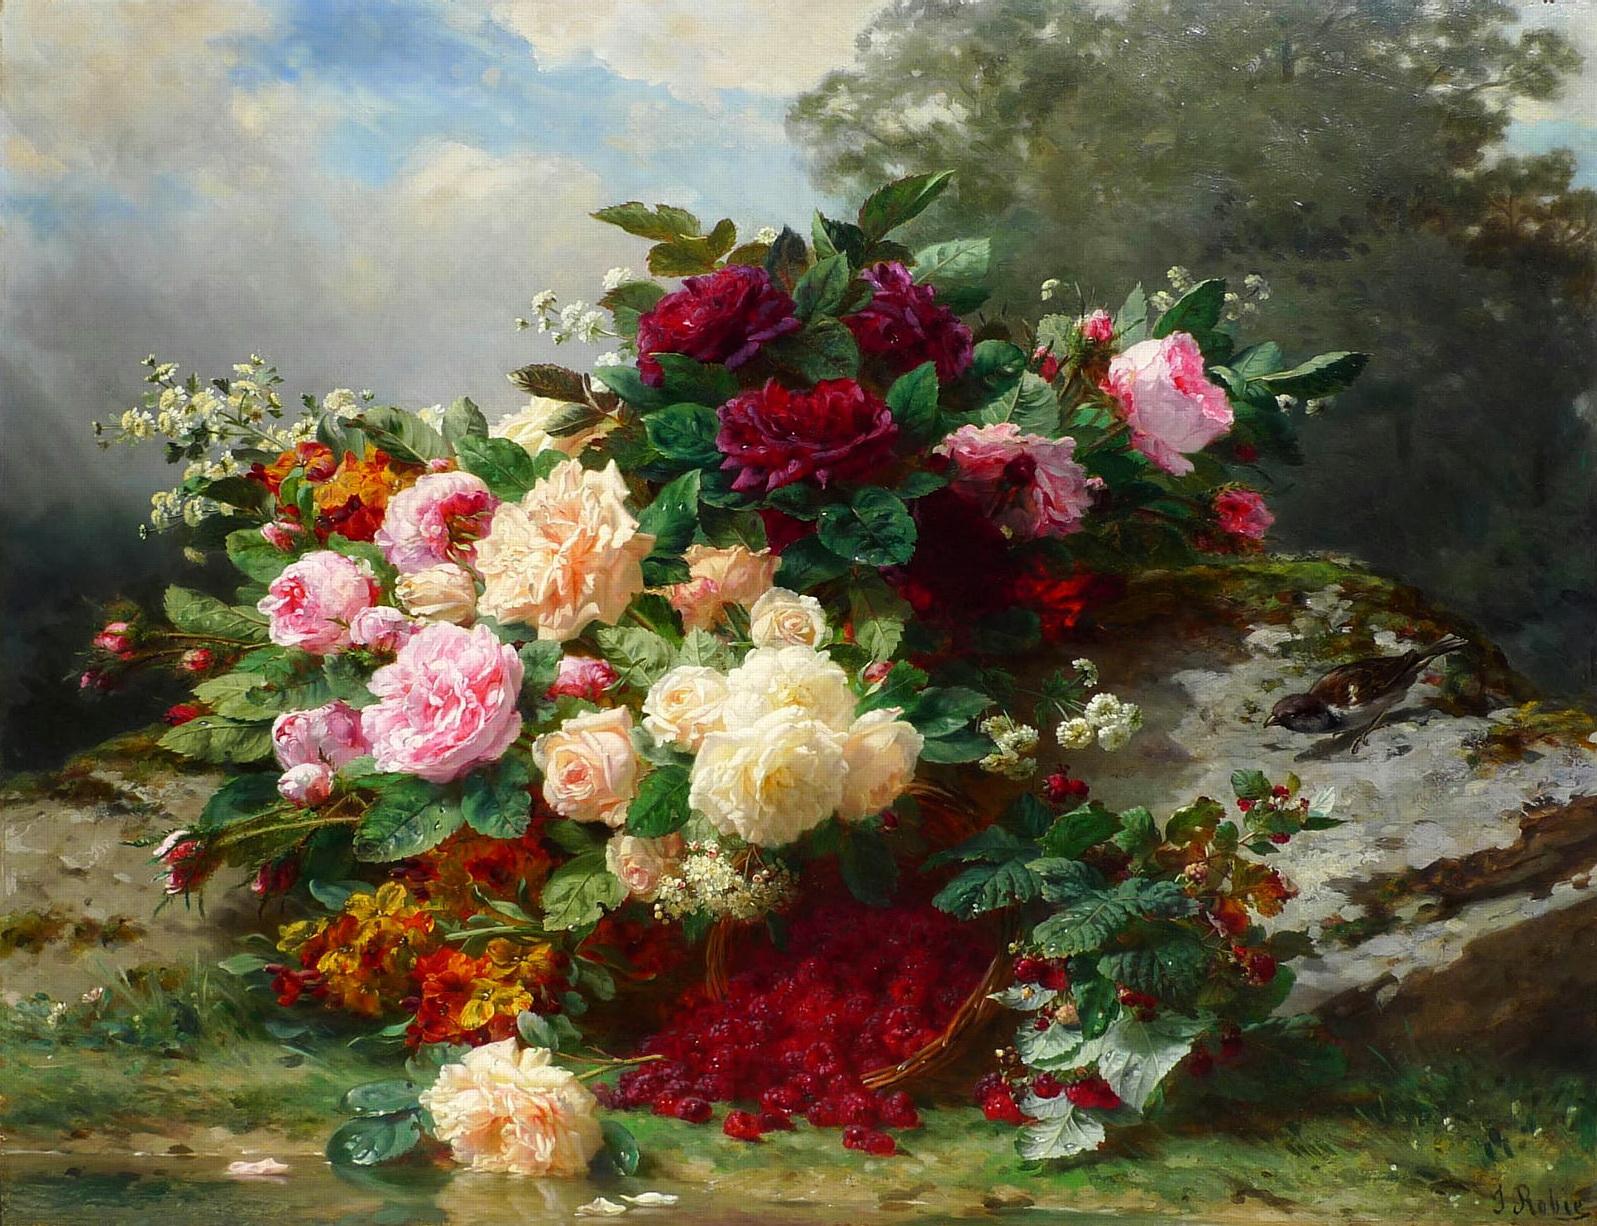 Натюрморт с цветами Жана Батиста Роби